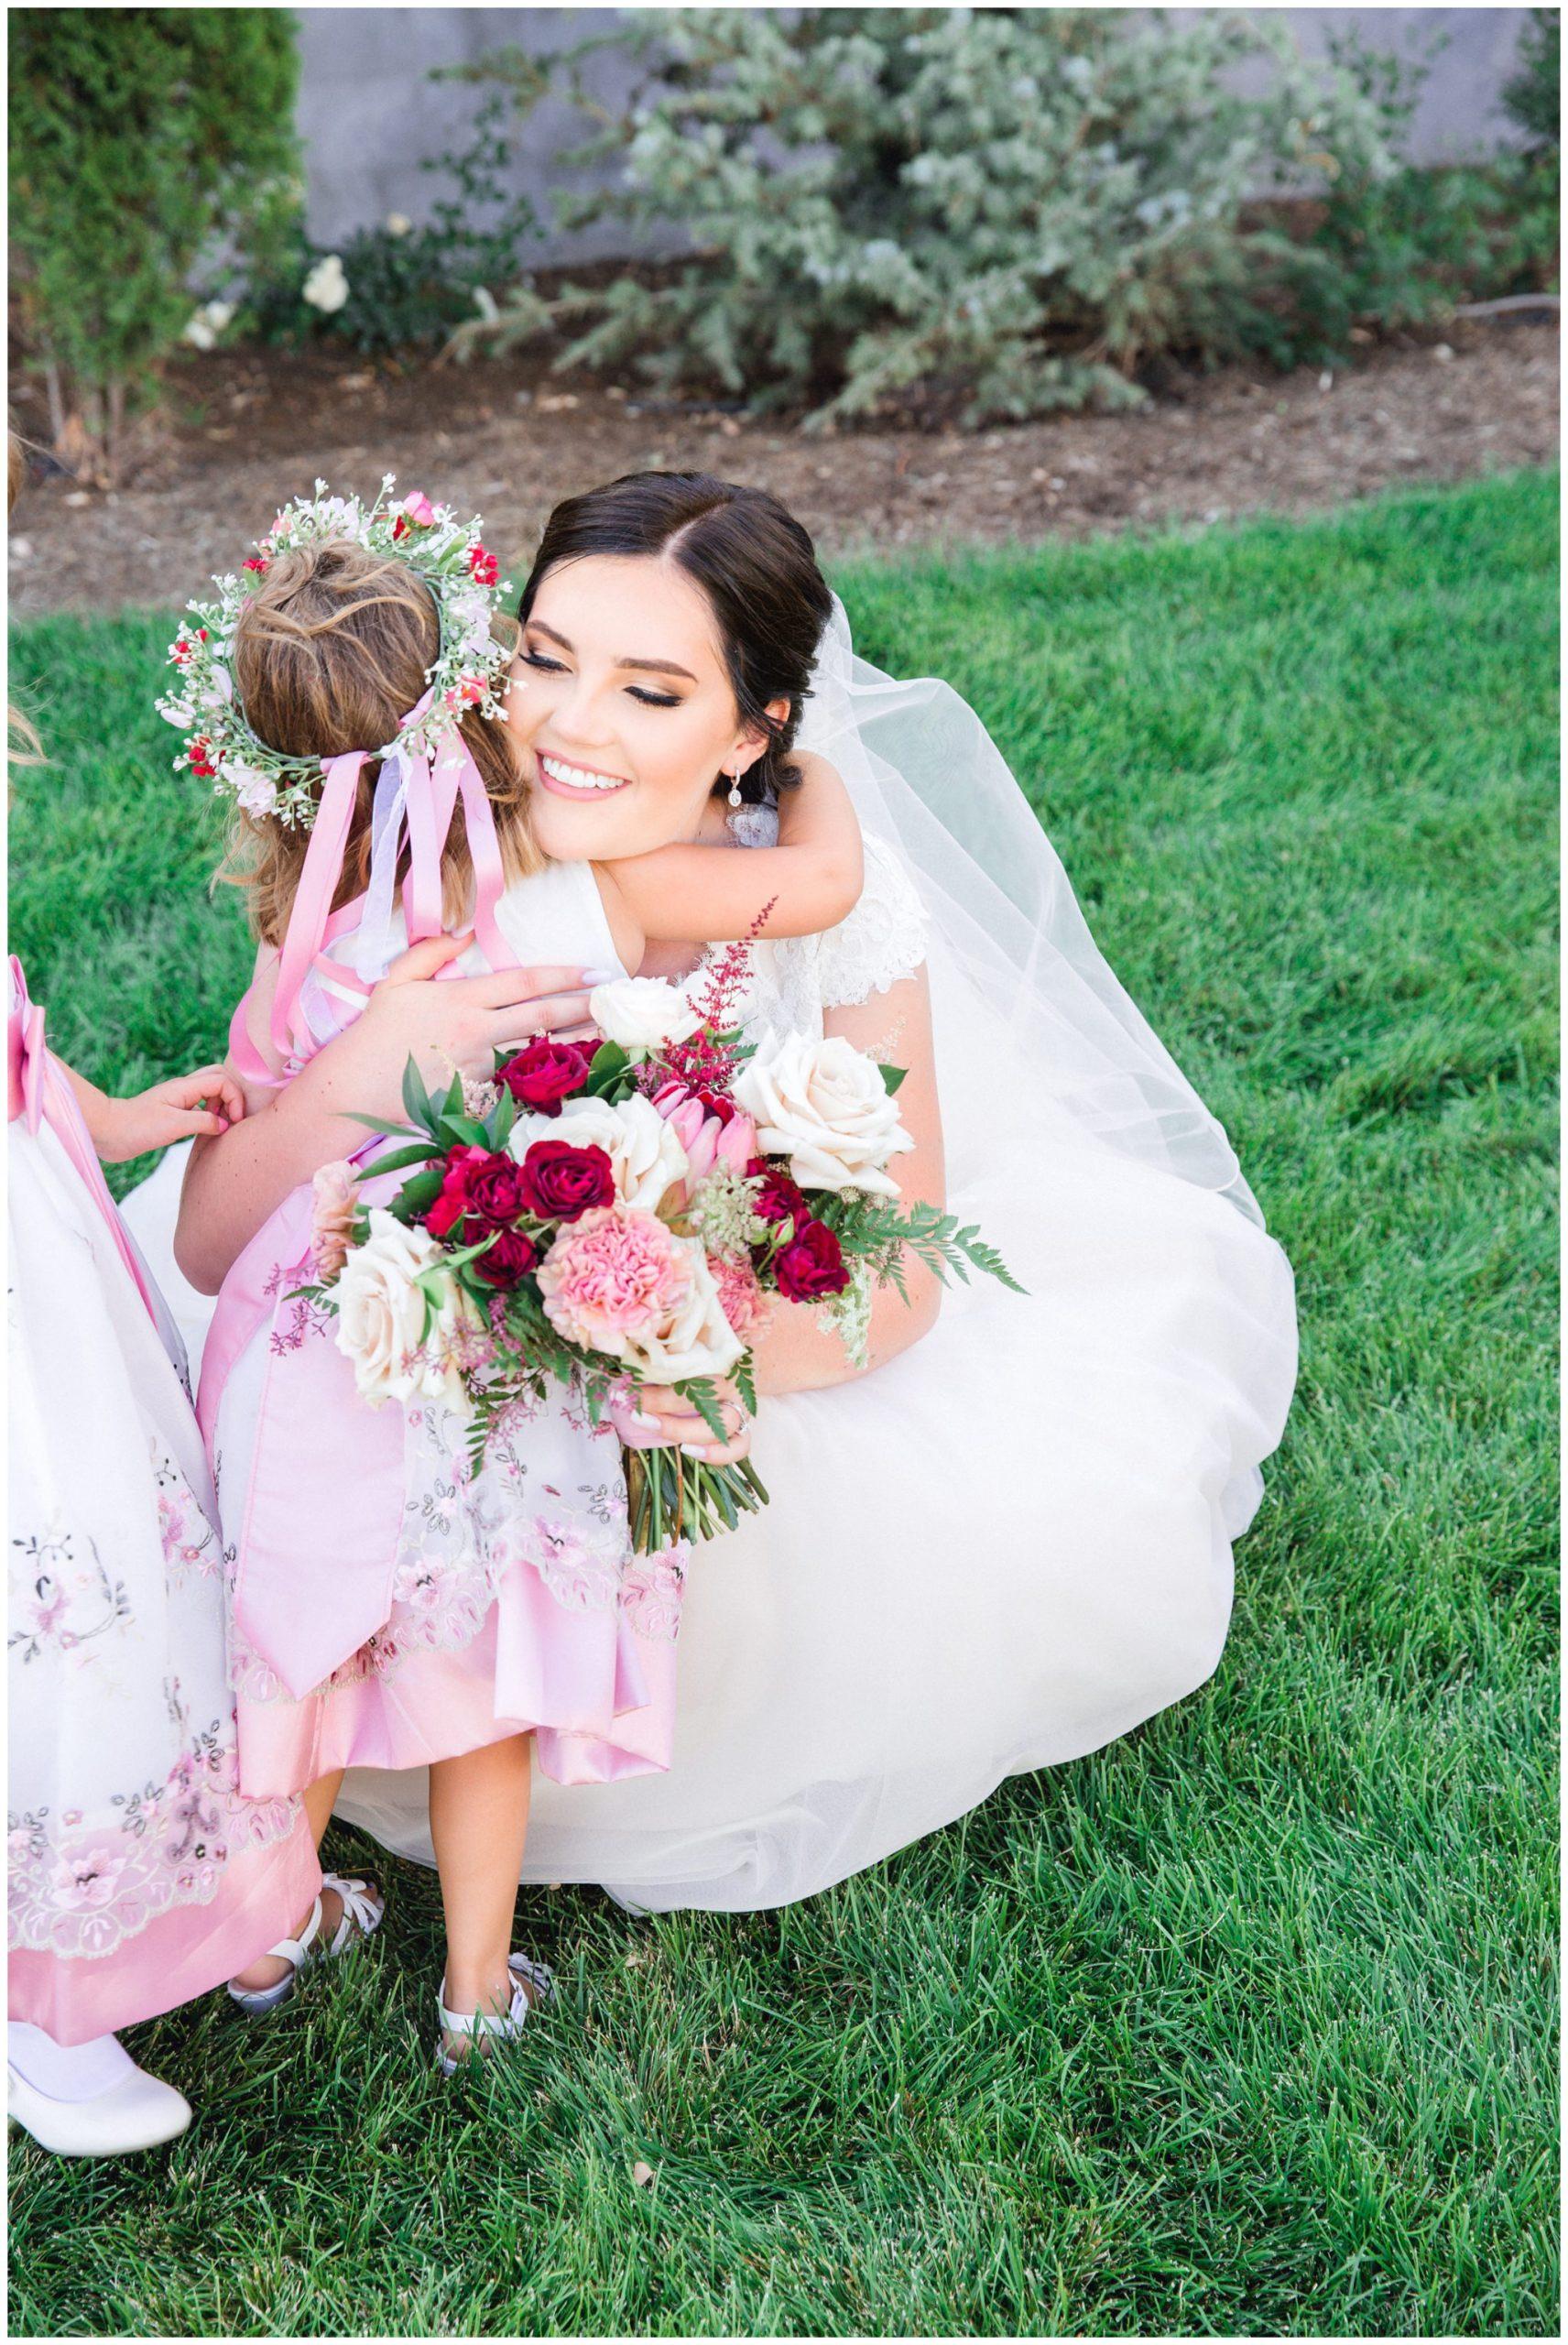 Bride hugging the flower girl at the wild oak wedding venue